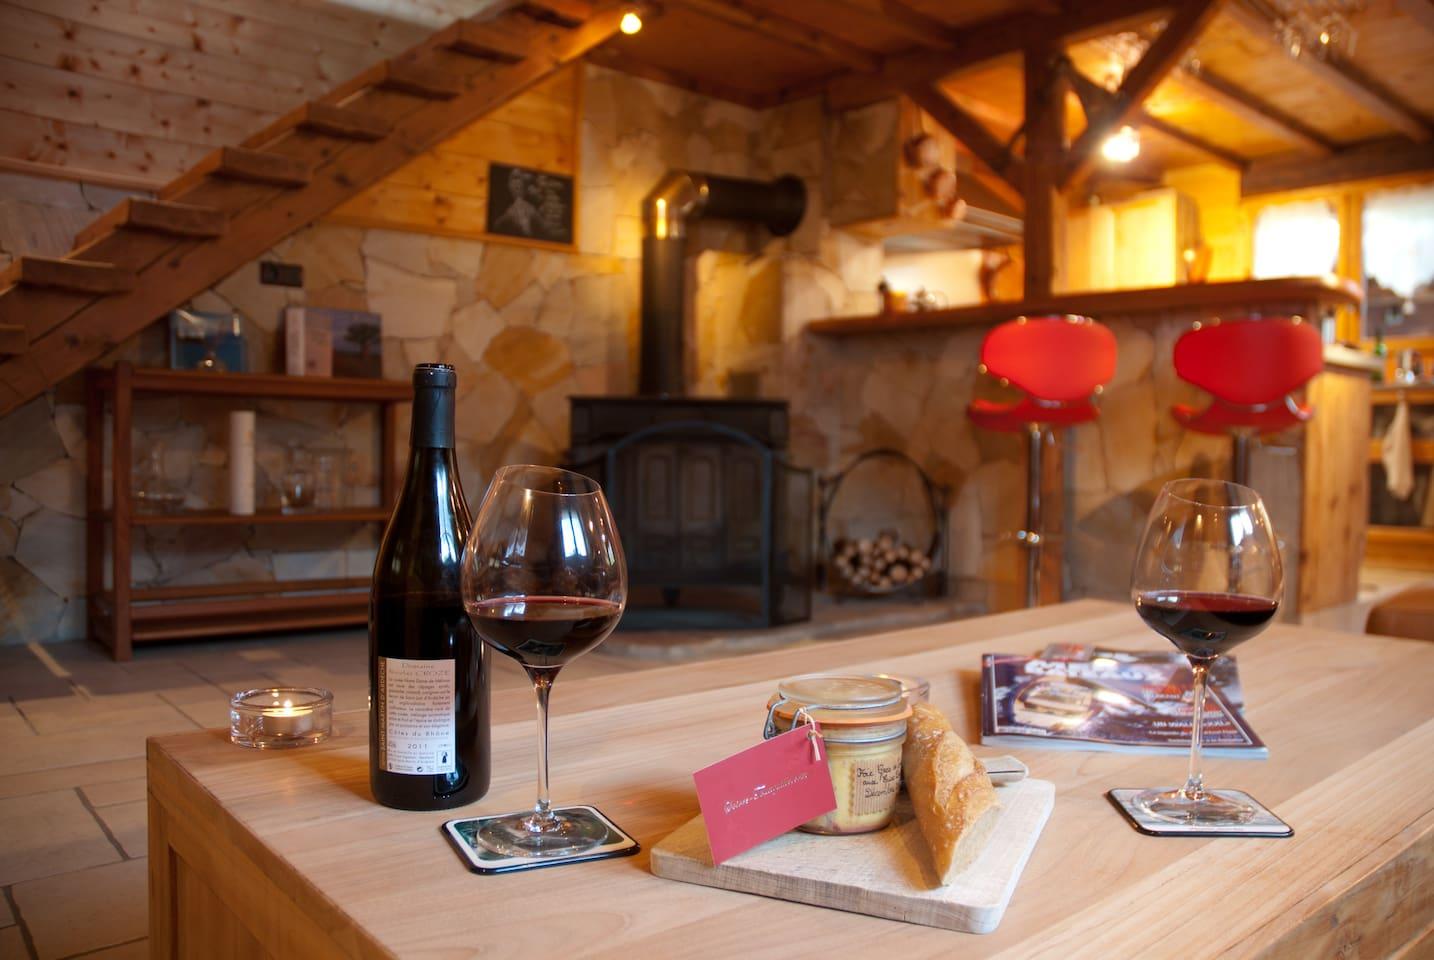 Salon côté Cheminée, Cuisine ouverte et Breakfast Bar / Lounge area by the fireplace and Breakfast Bar